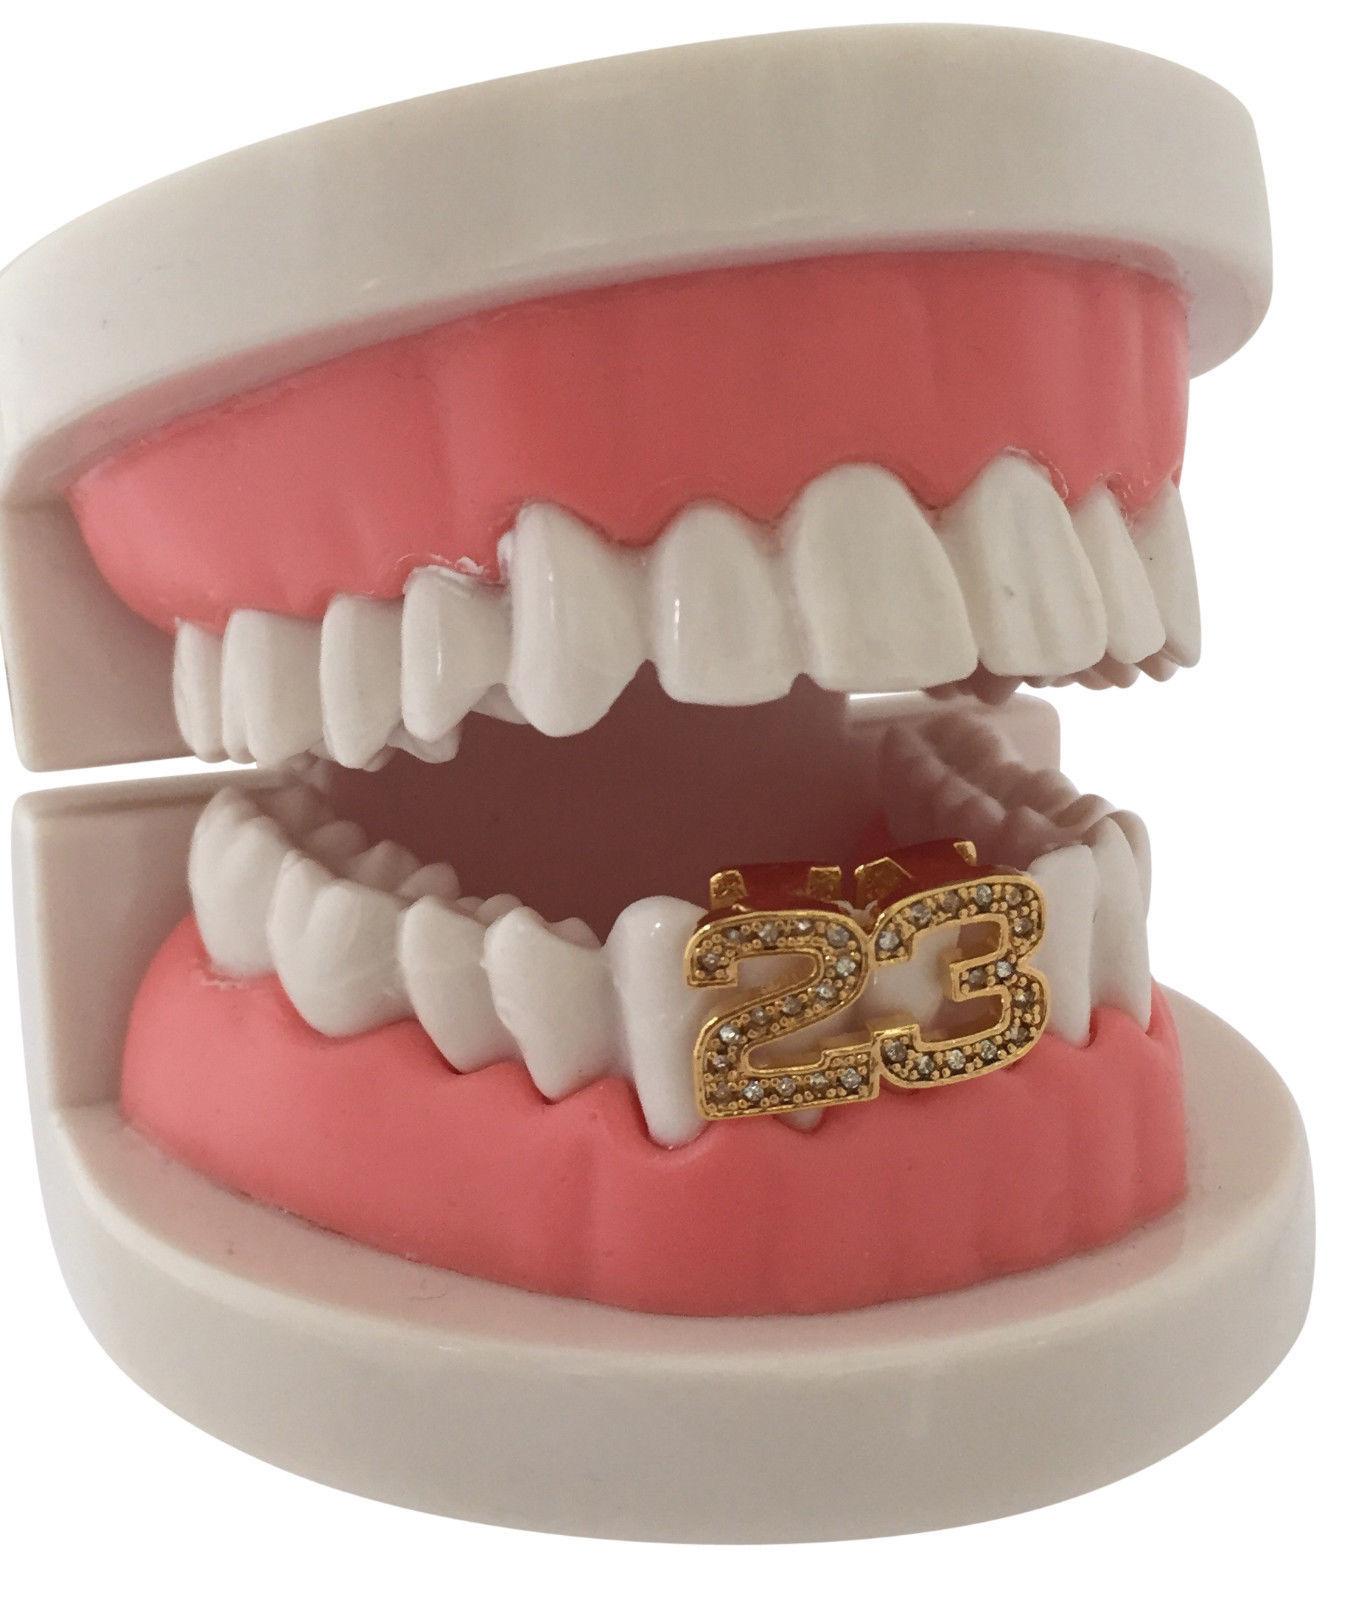 Hip Hop 14K Gold GP #23 23 Air Jordan Two Tooth Teeth Grillz Grill Lower Cap